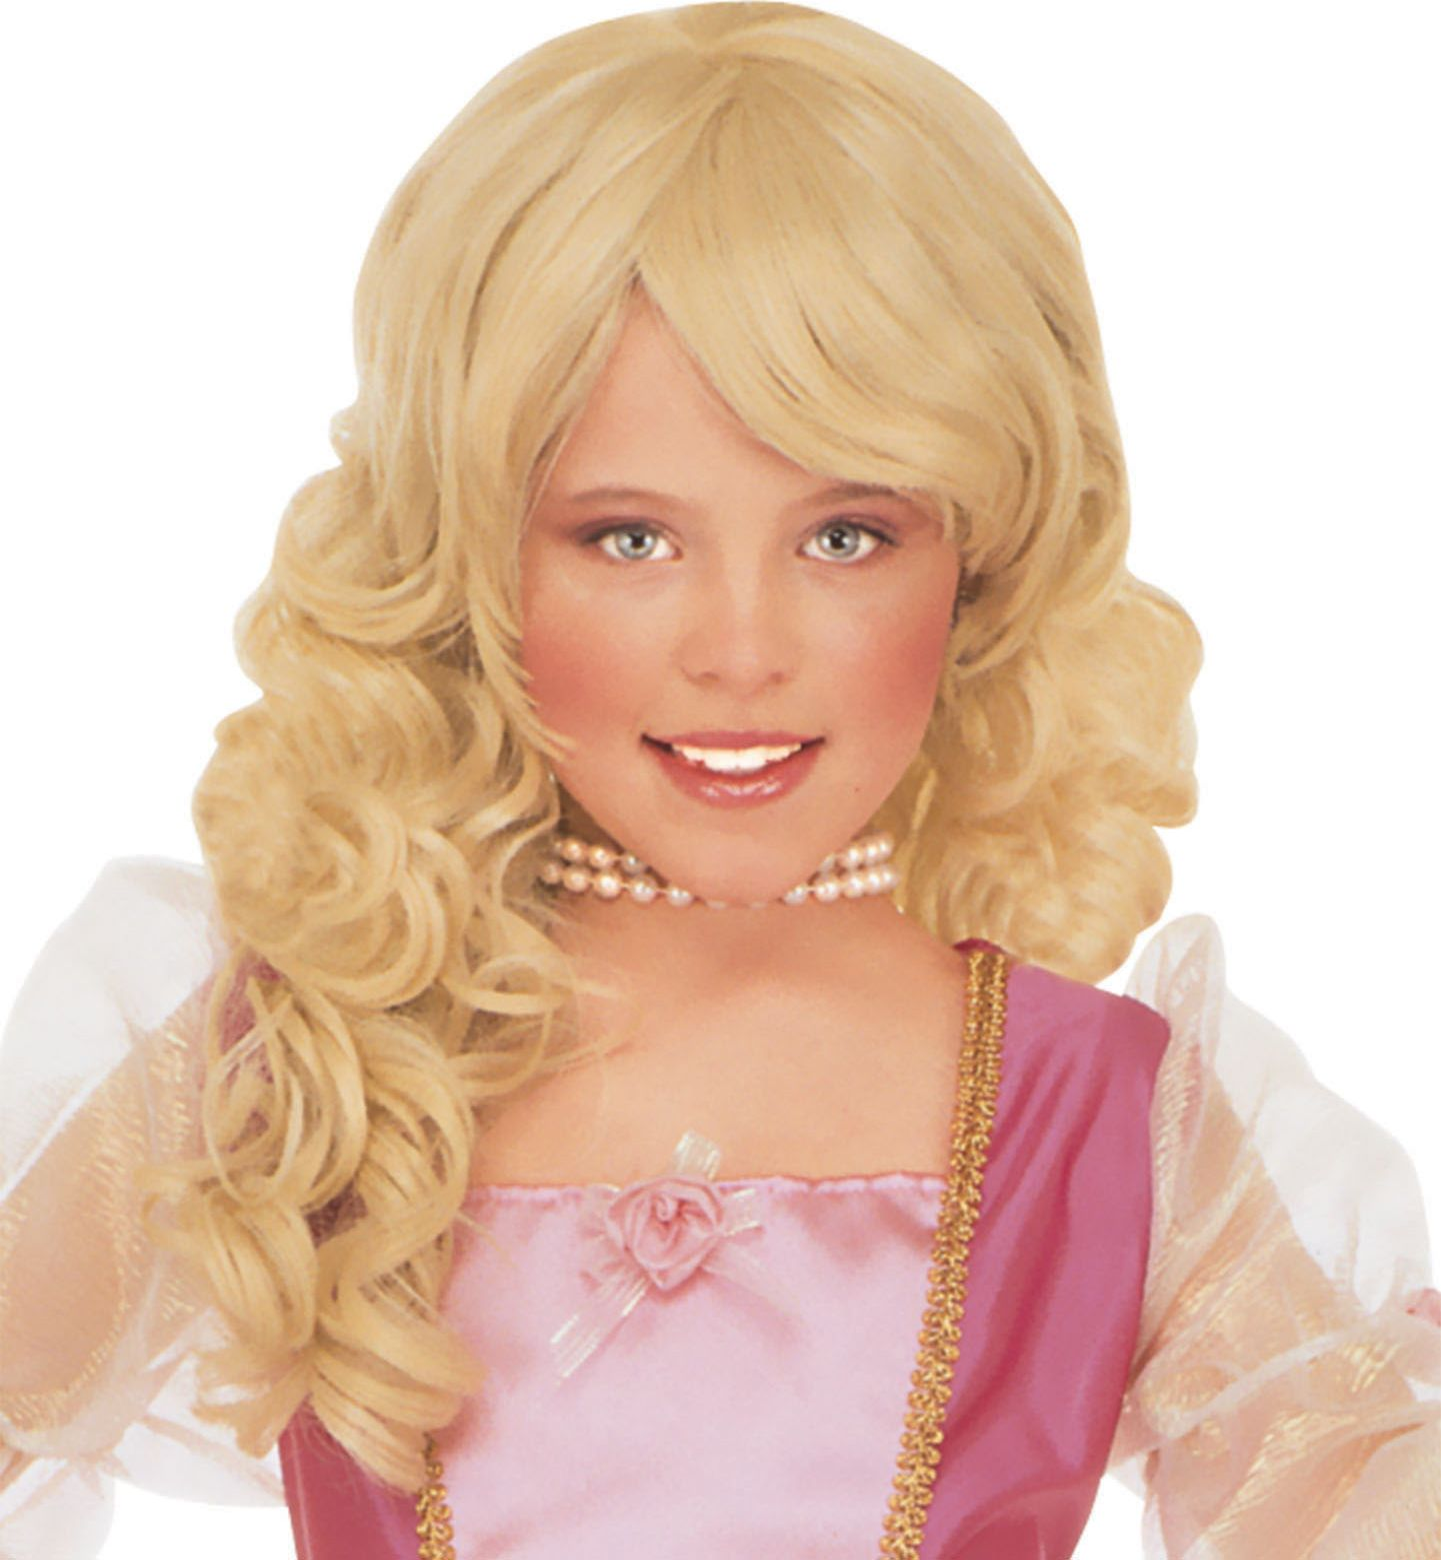 Lange blonde pruik met krullen kind